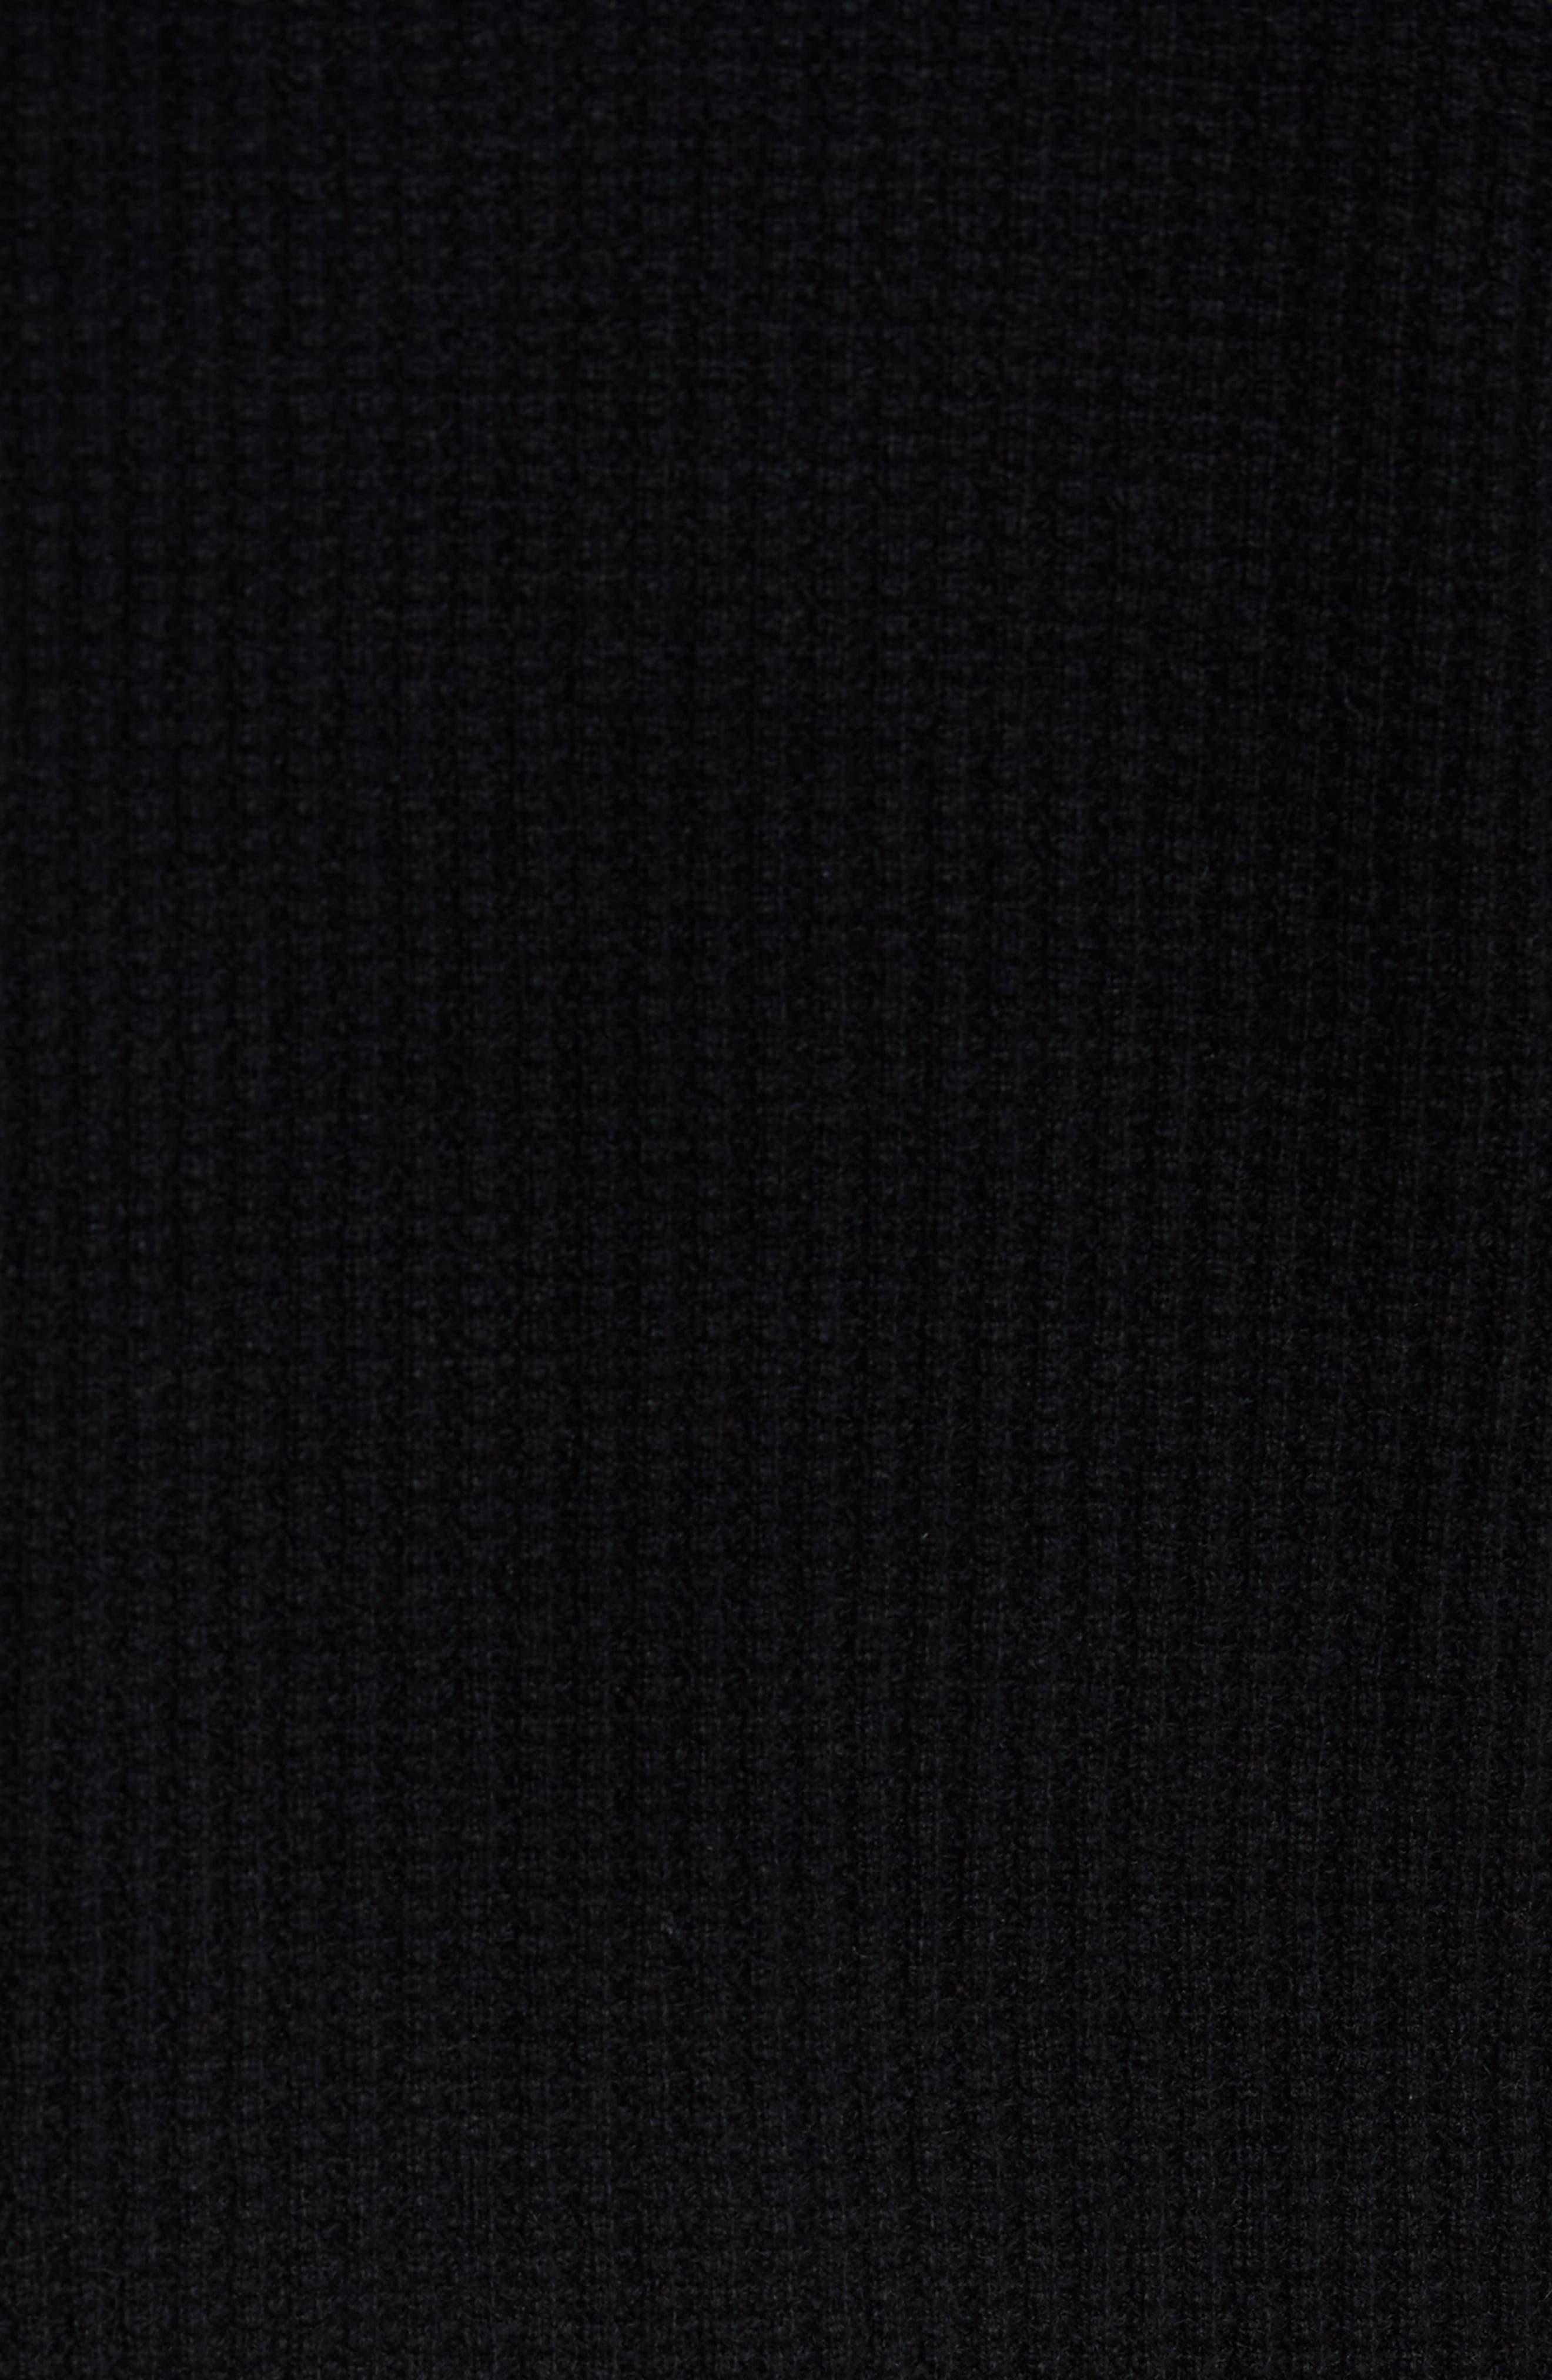 Deklyn Slim Fit Merino & Cashmere Sweatshirt,                             Alternate thumbnail 5, color,                             001